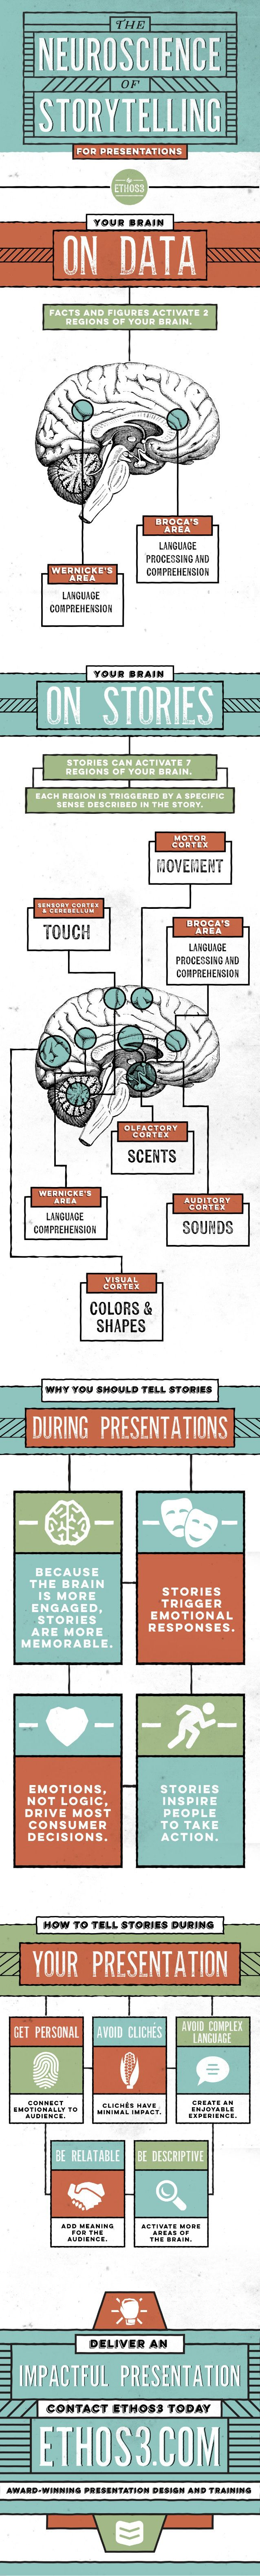 storytelling-infographic